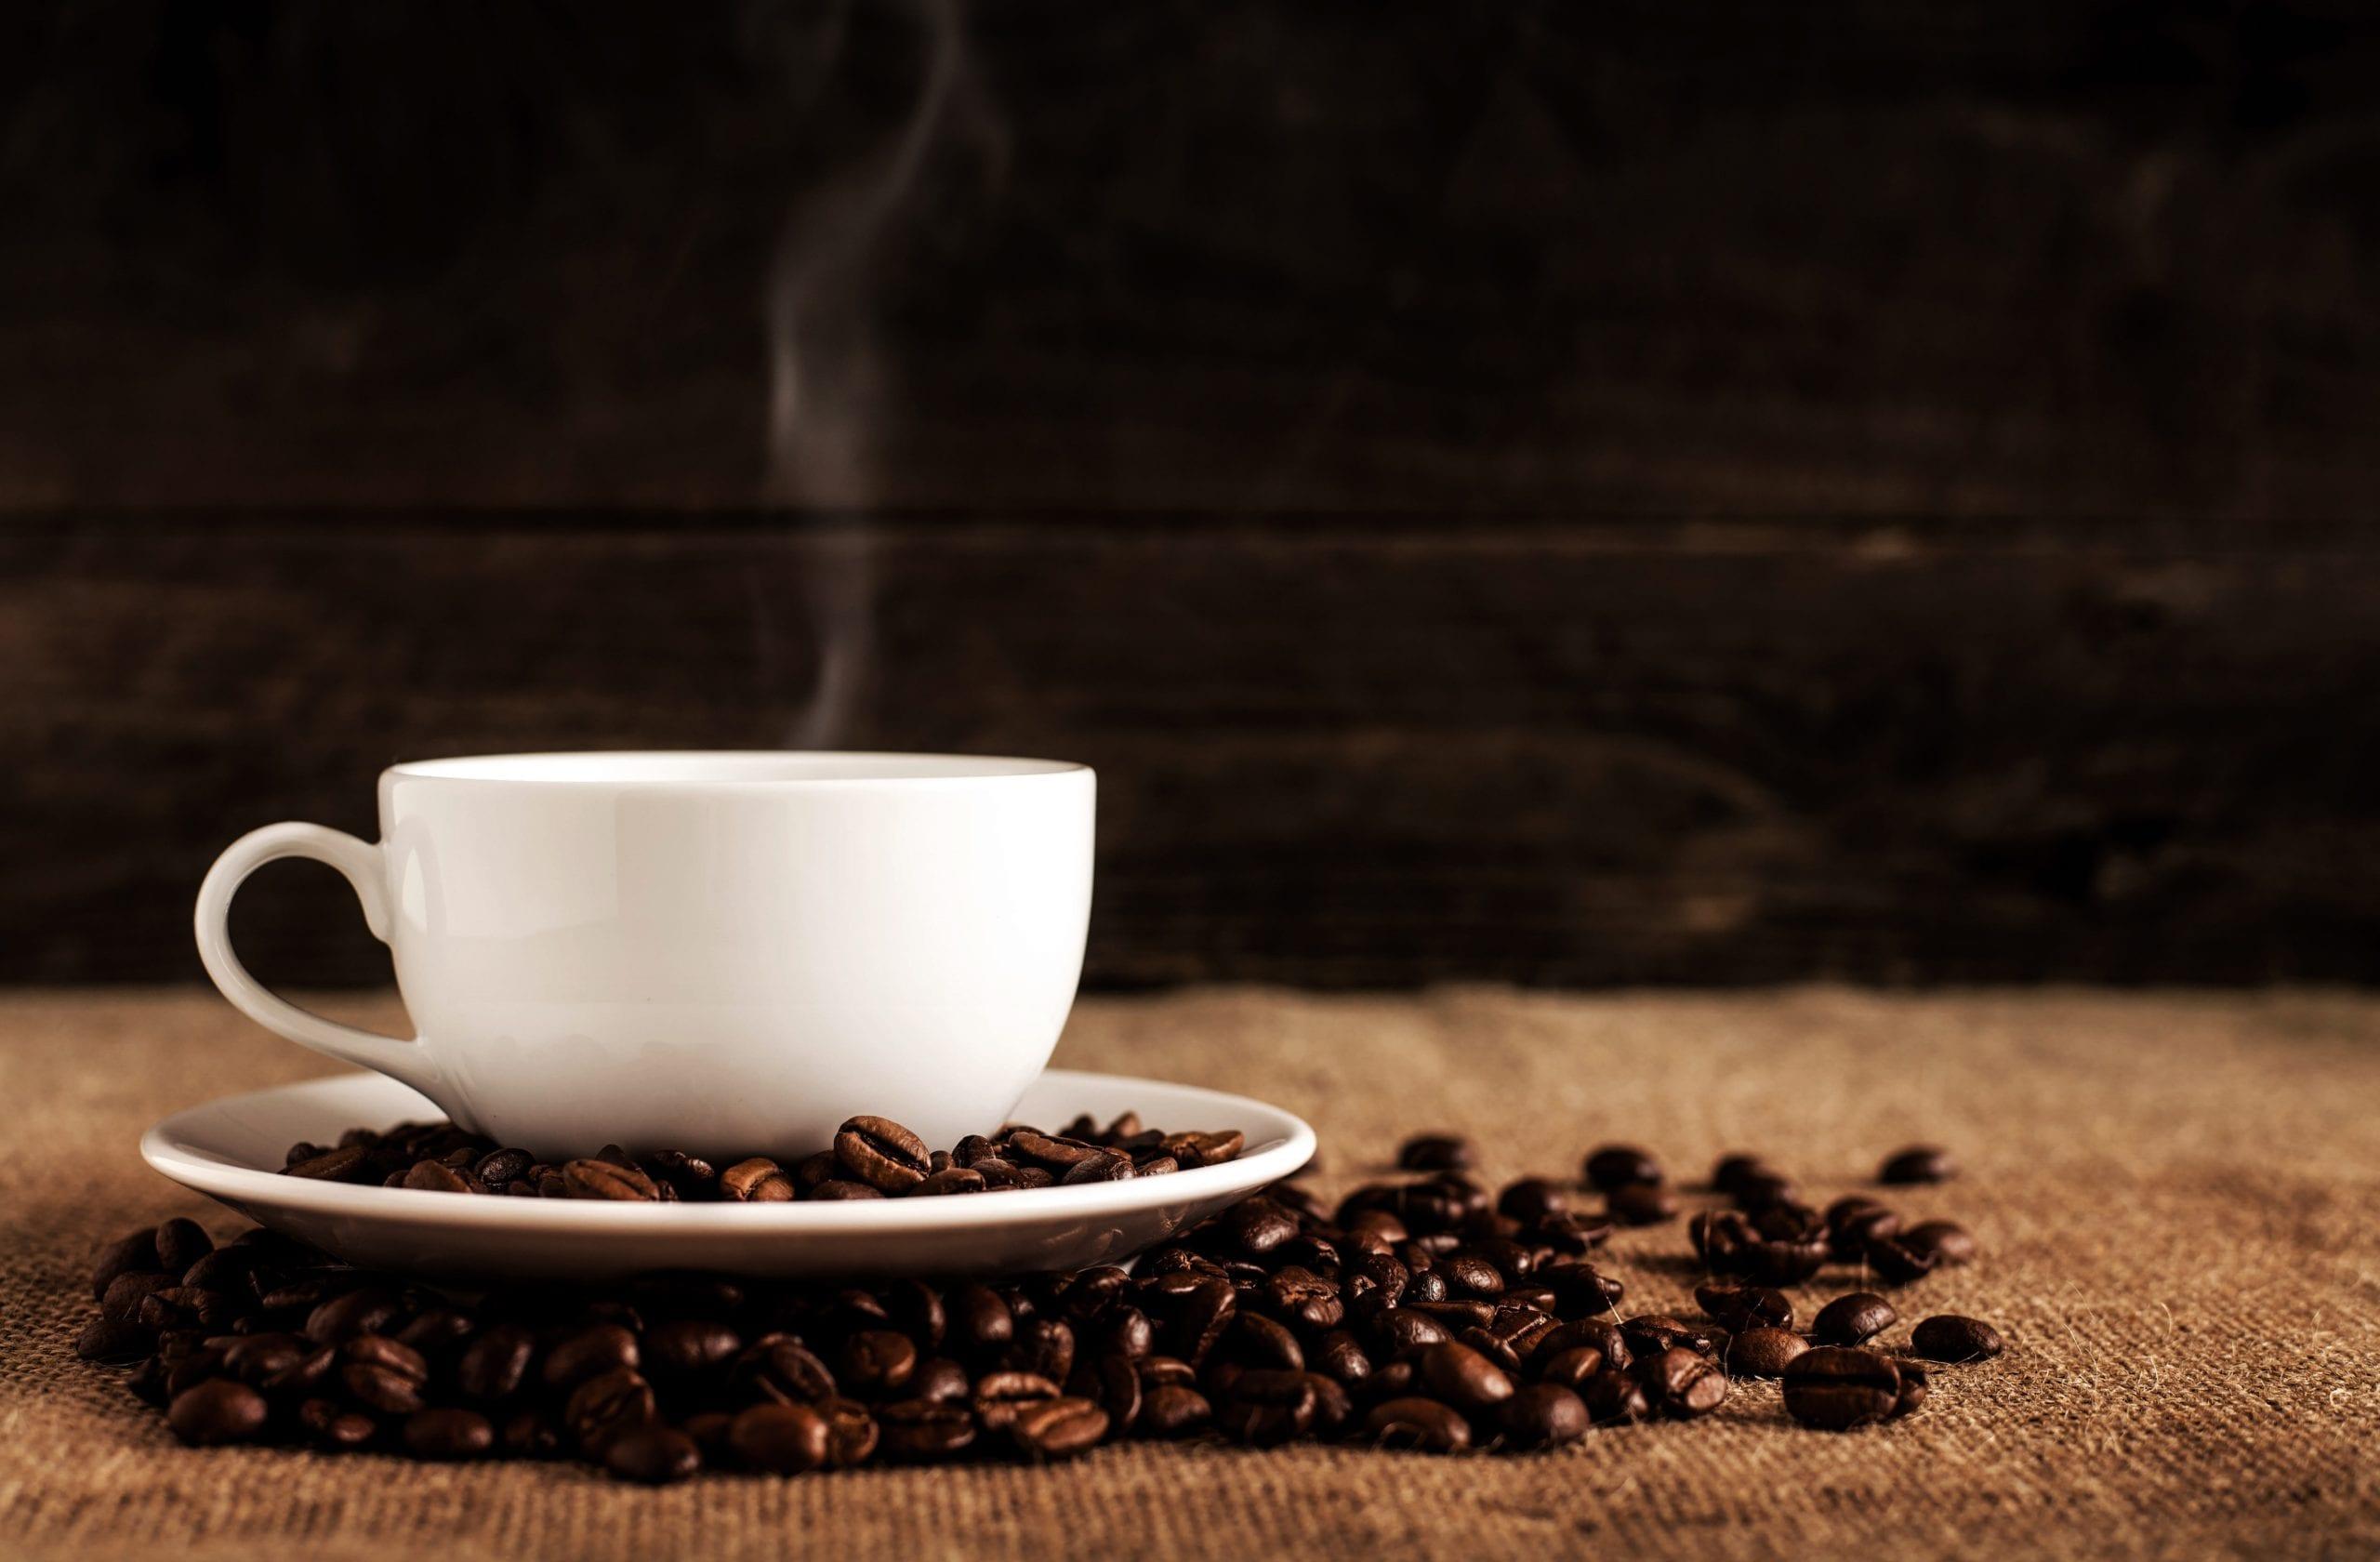 Atlanta coffee has health benefits